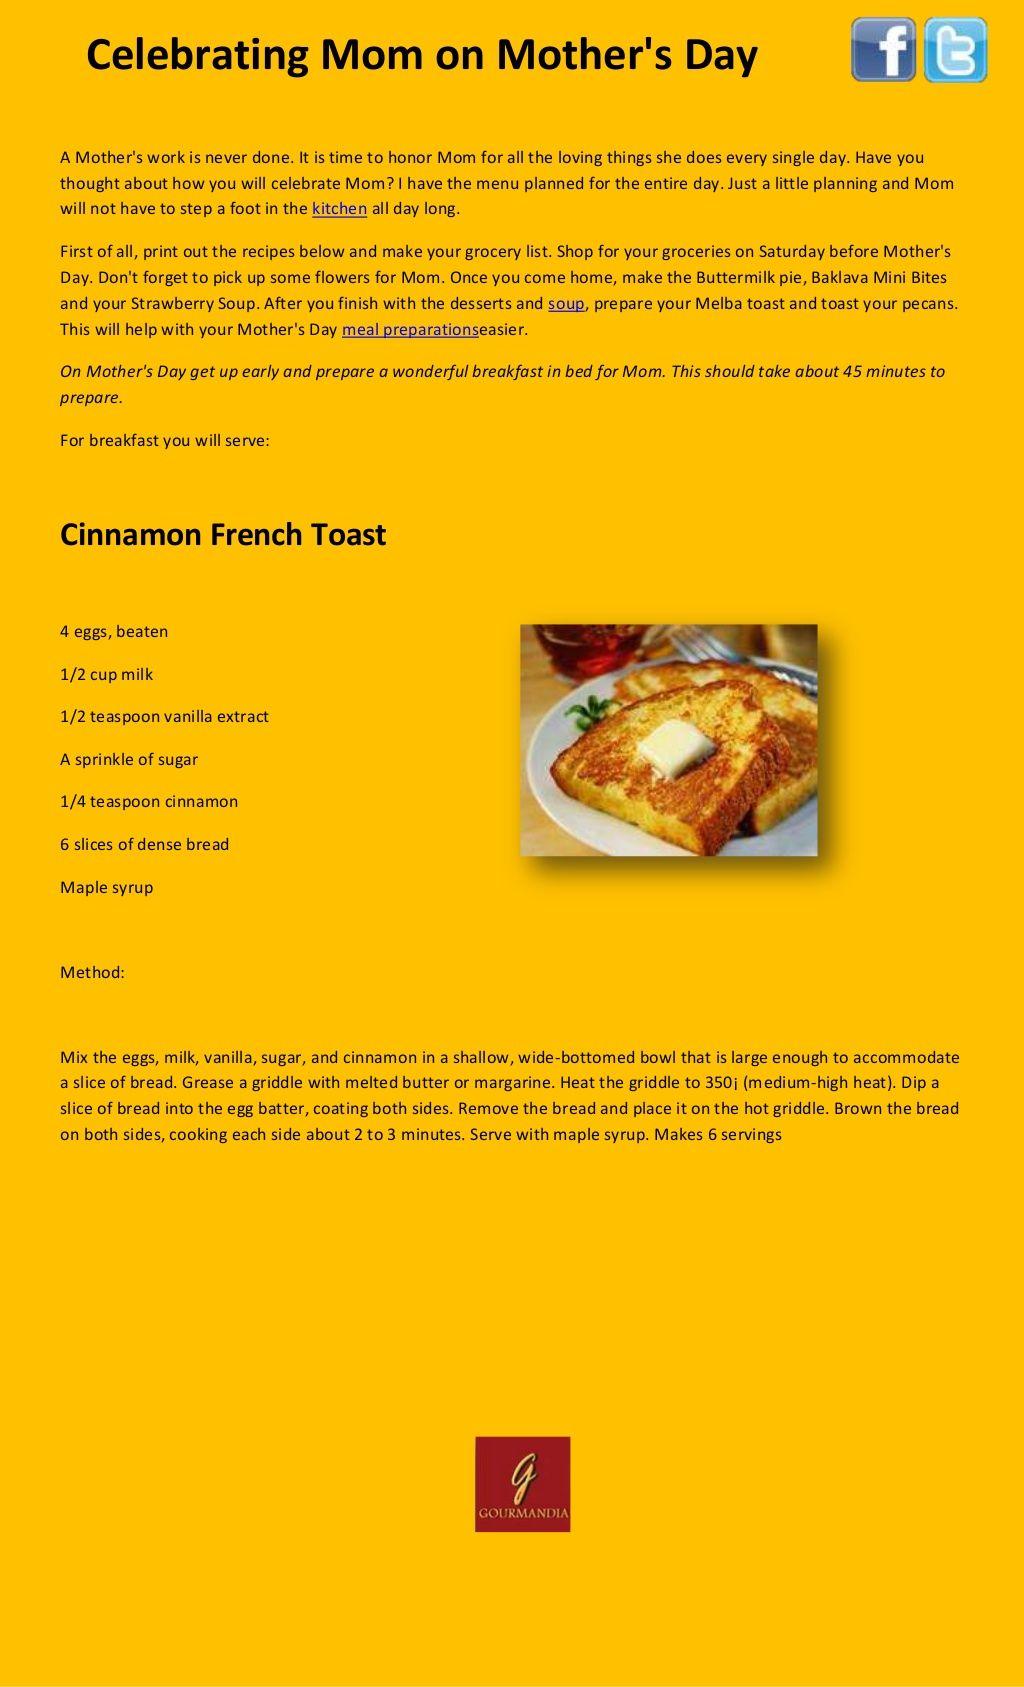 cinnamon-french-toast-for-you-mom by Cody Bosh via Slideshare